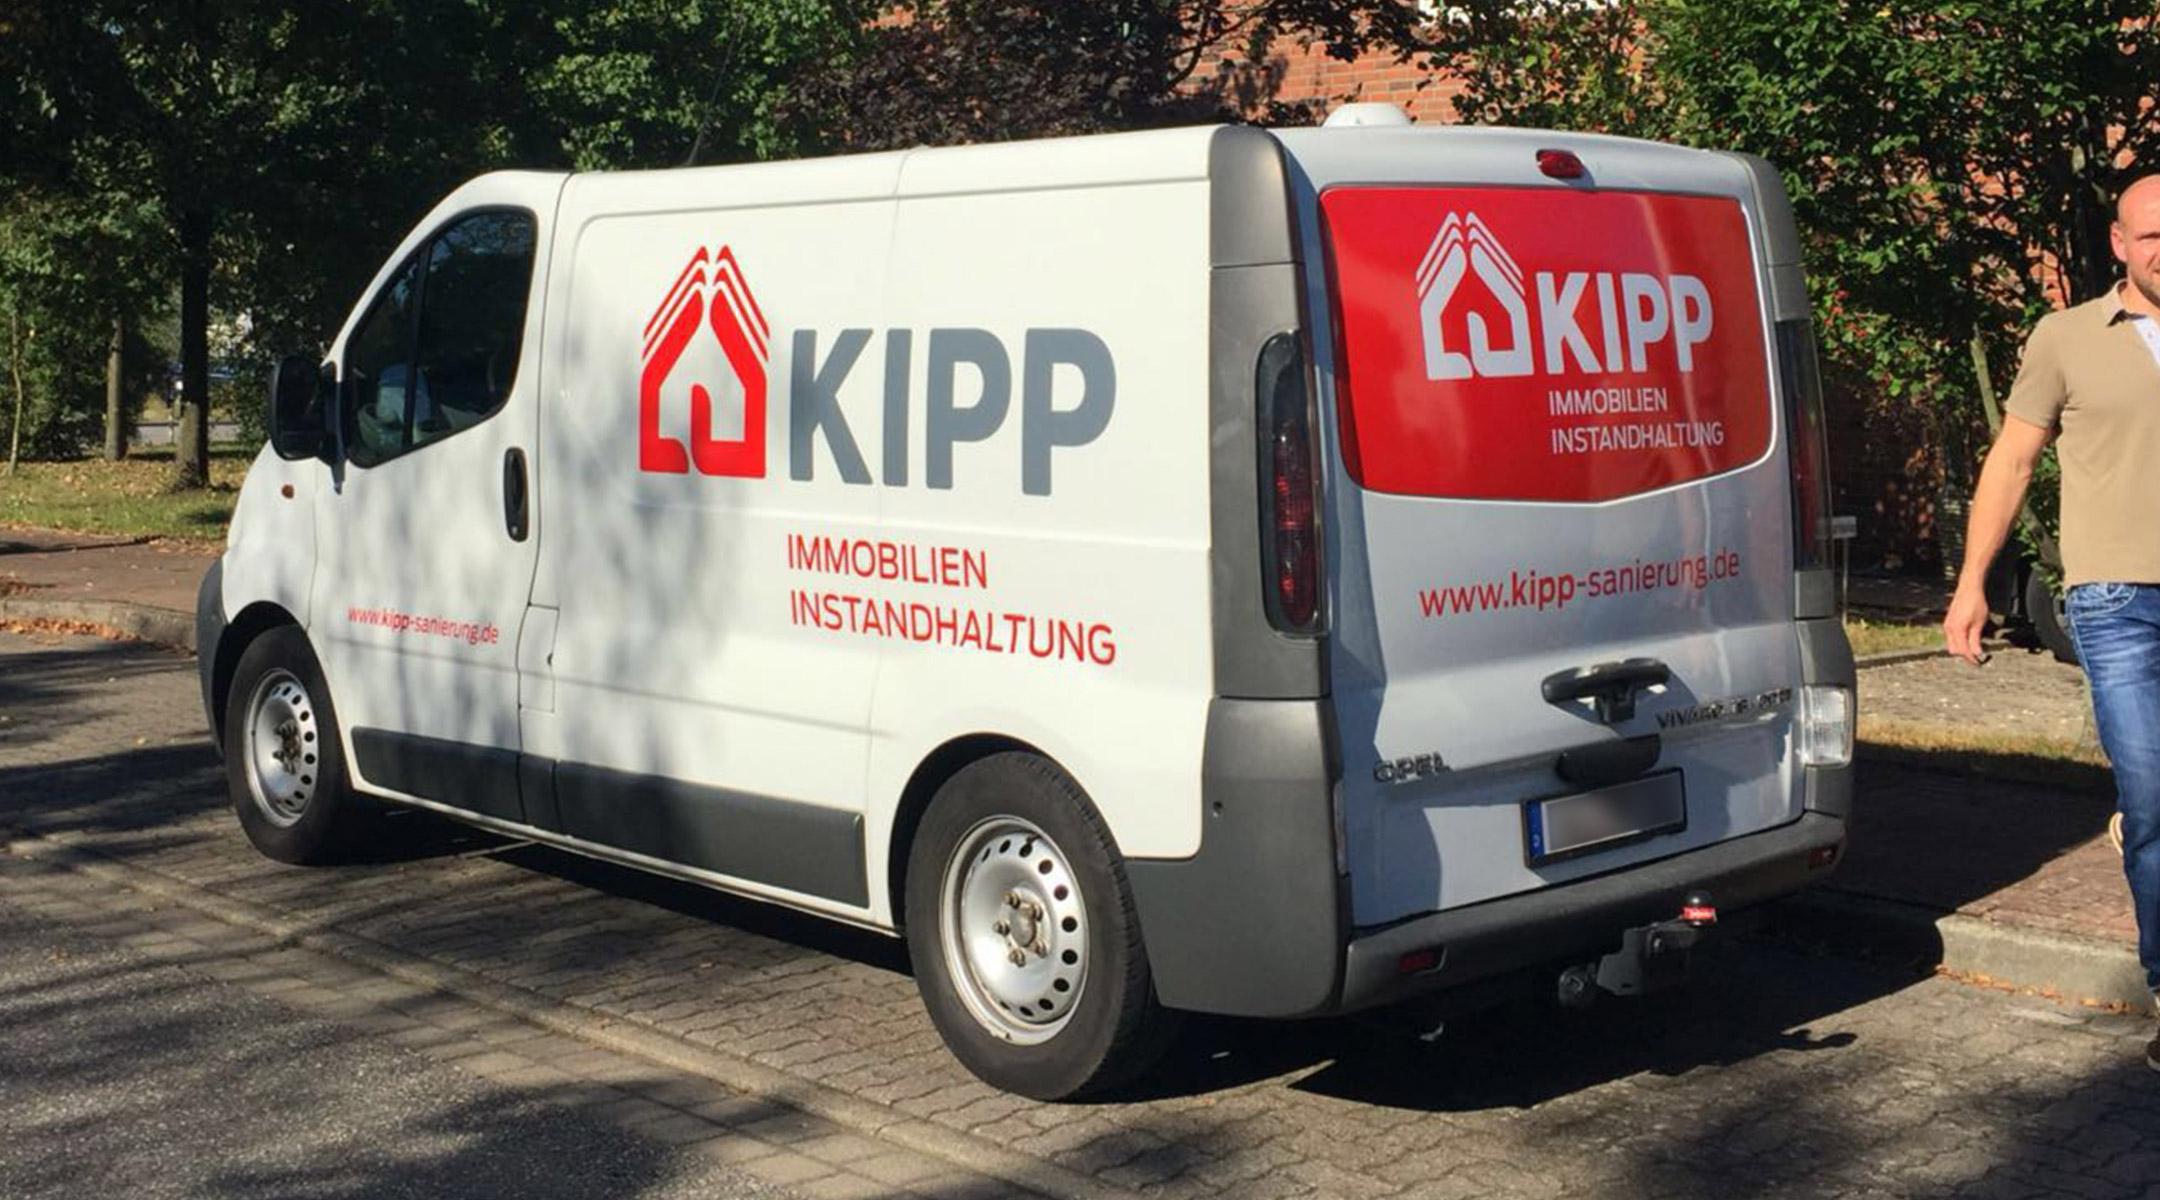 kipp_auto